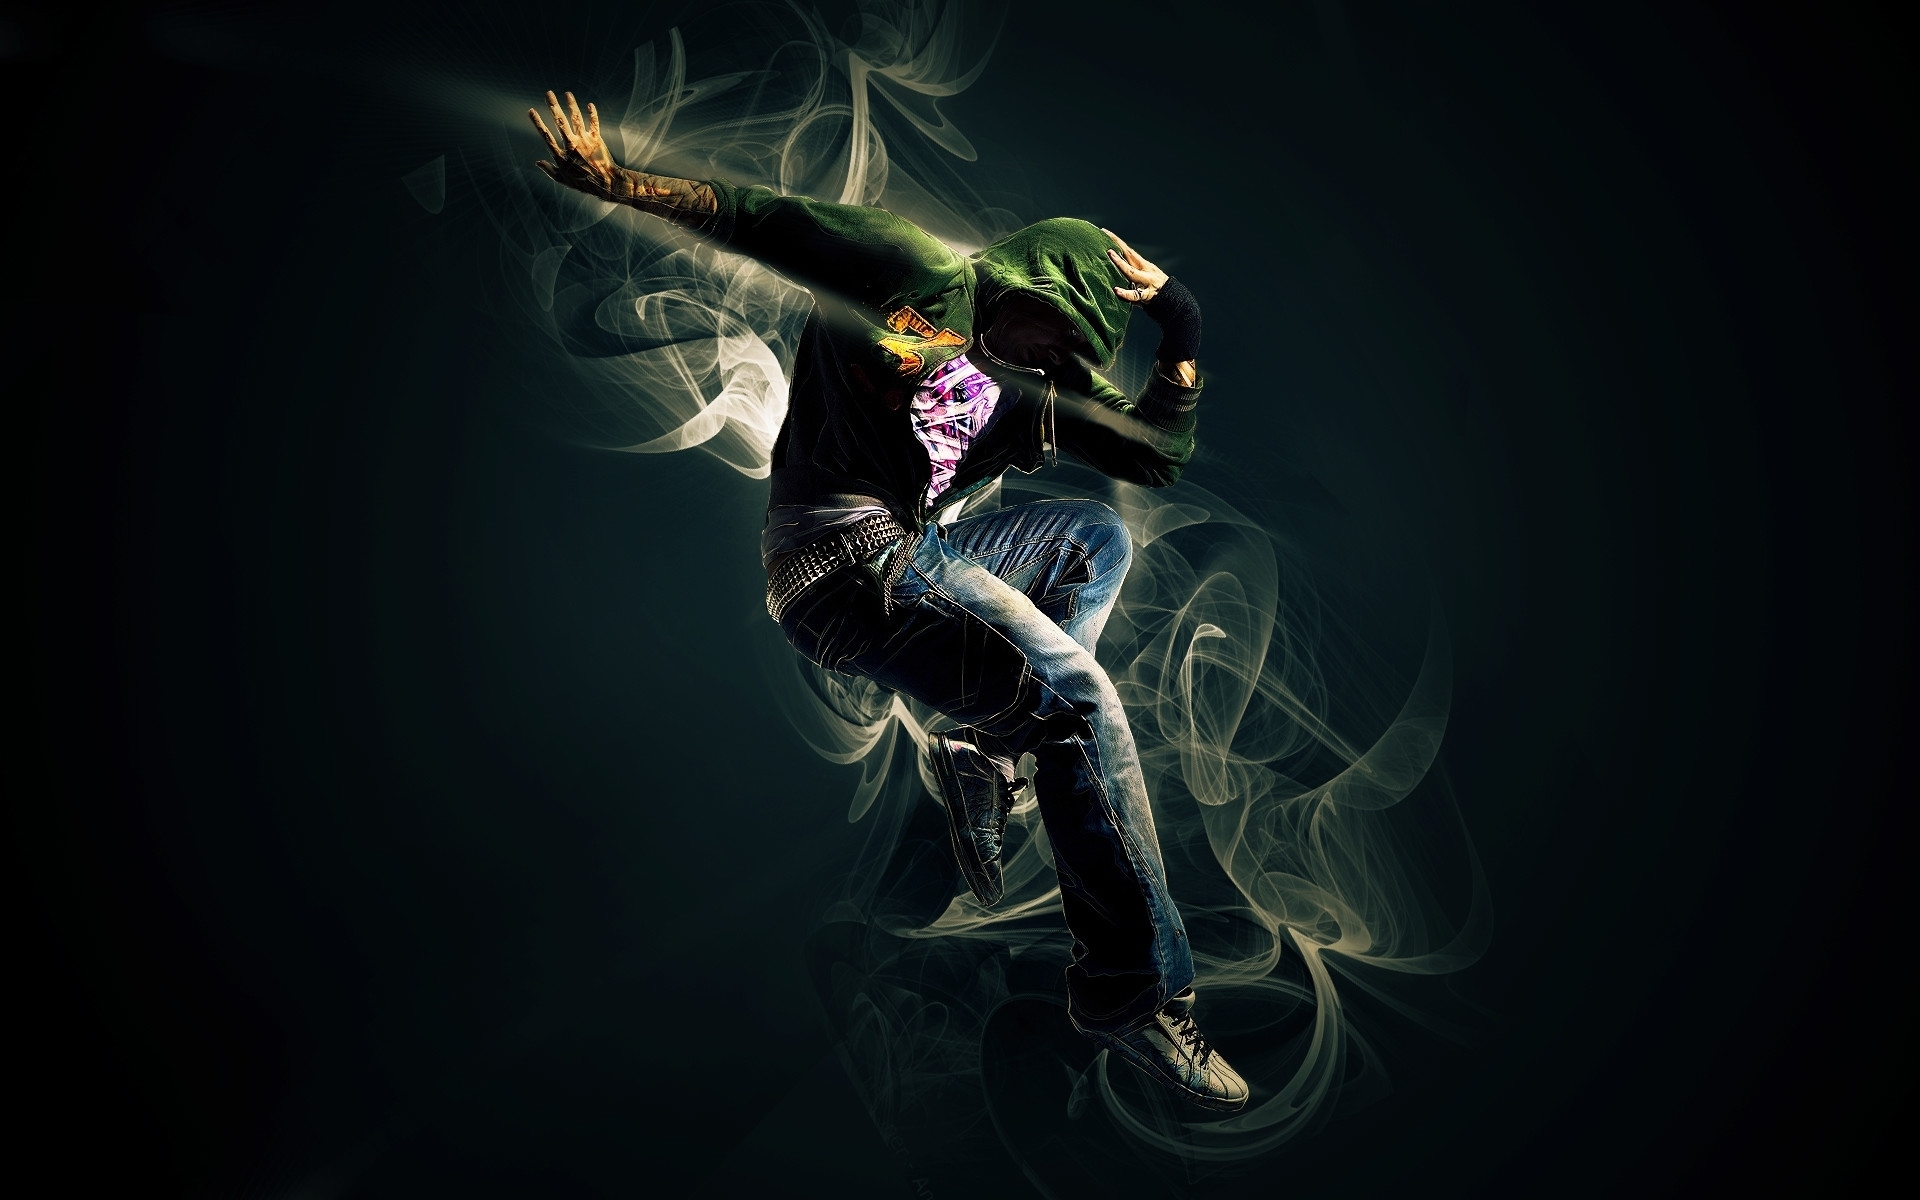 hip hop dance wallpaper (72+ images)